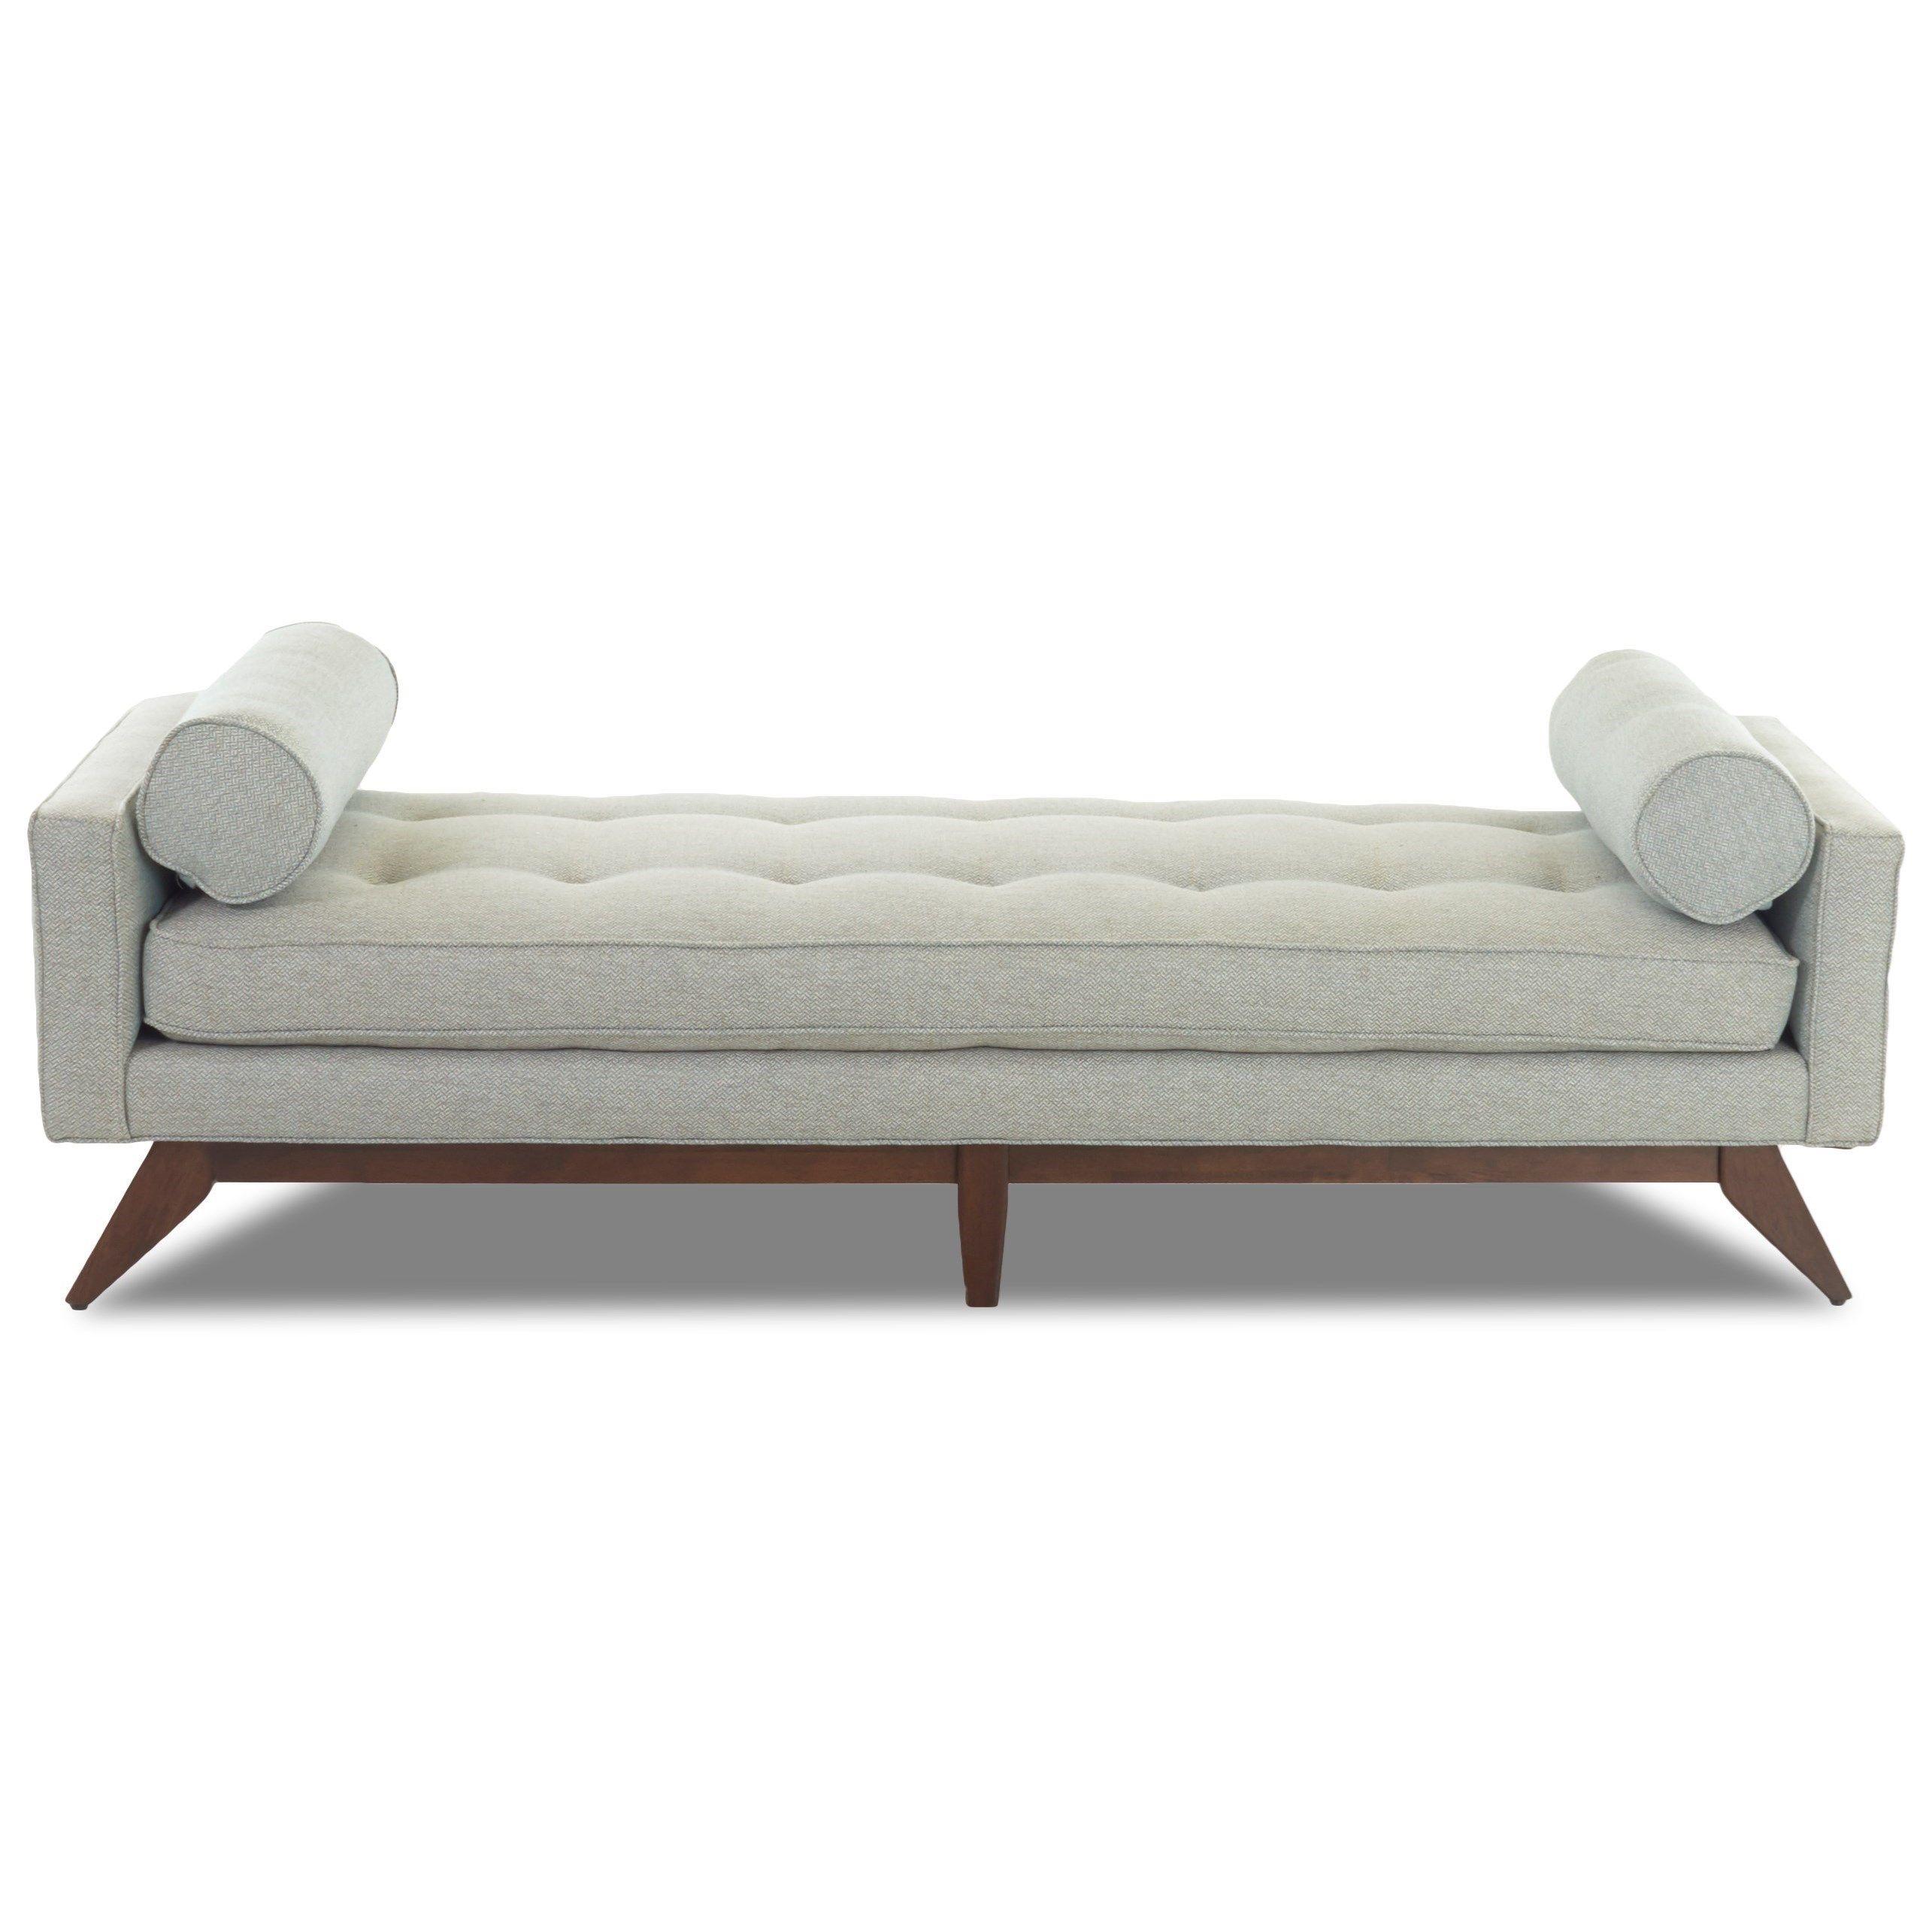 Backless Sofa Bench